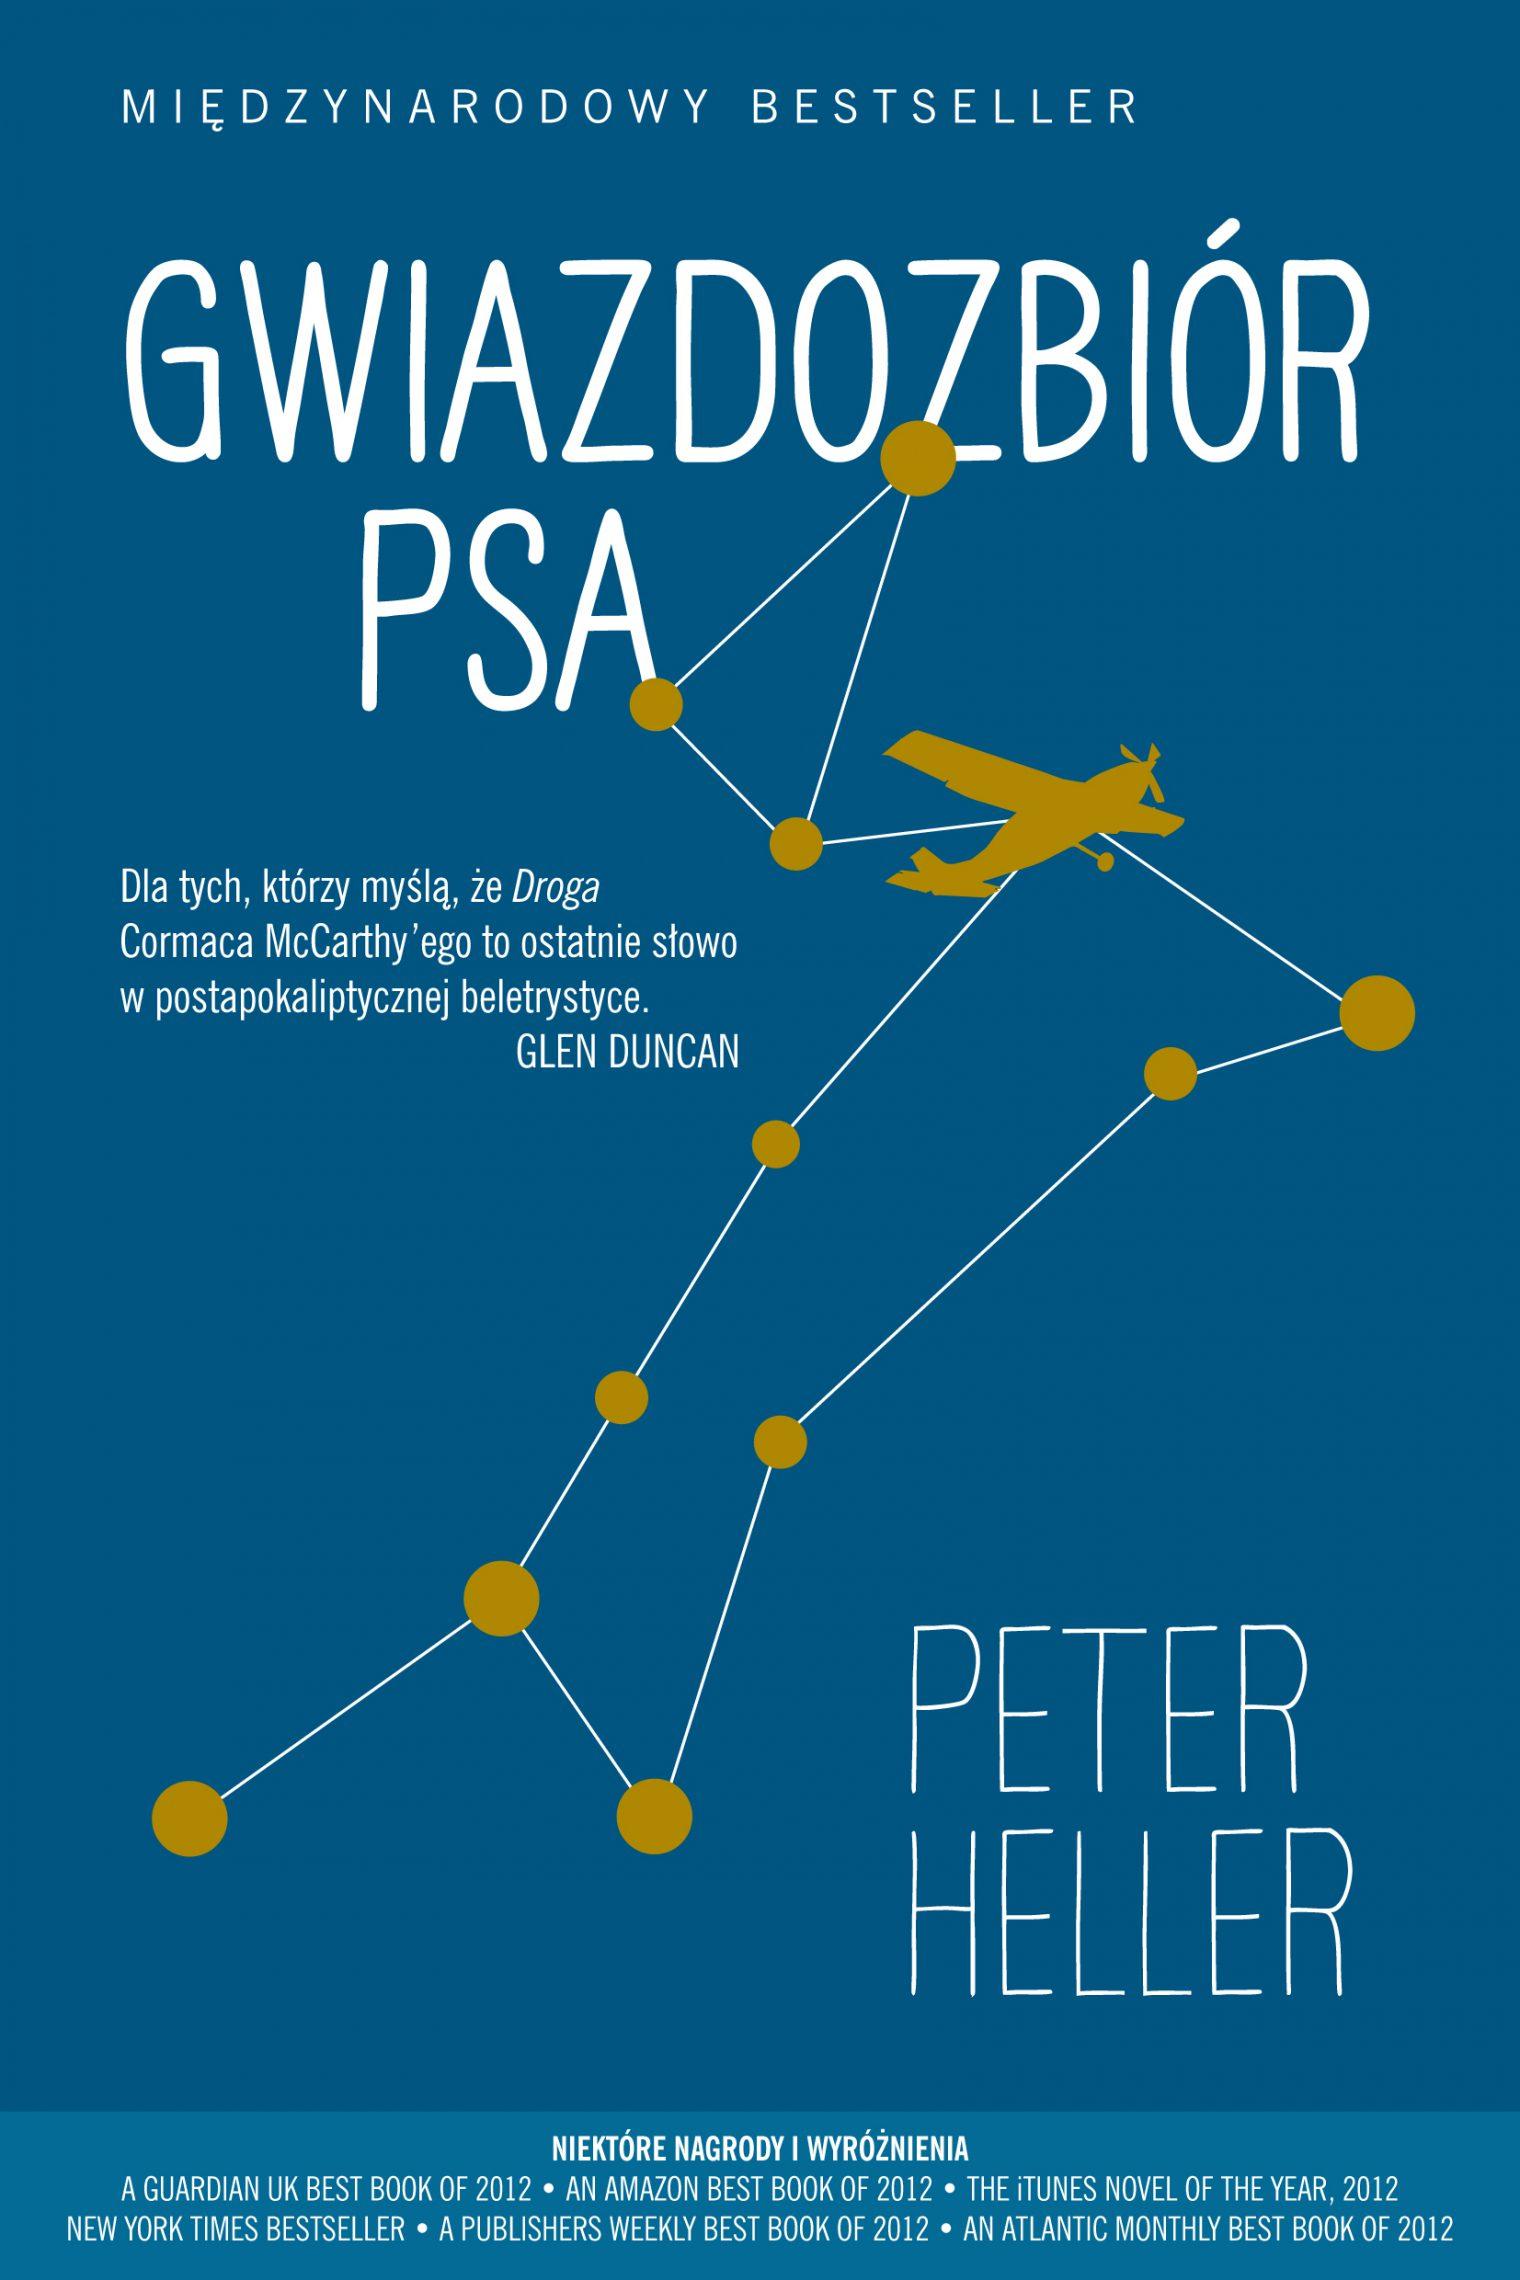 Peter_Heller_Gwiazdozbior_Psa